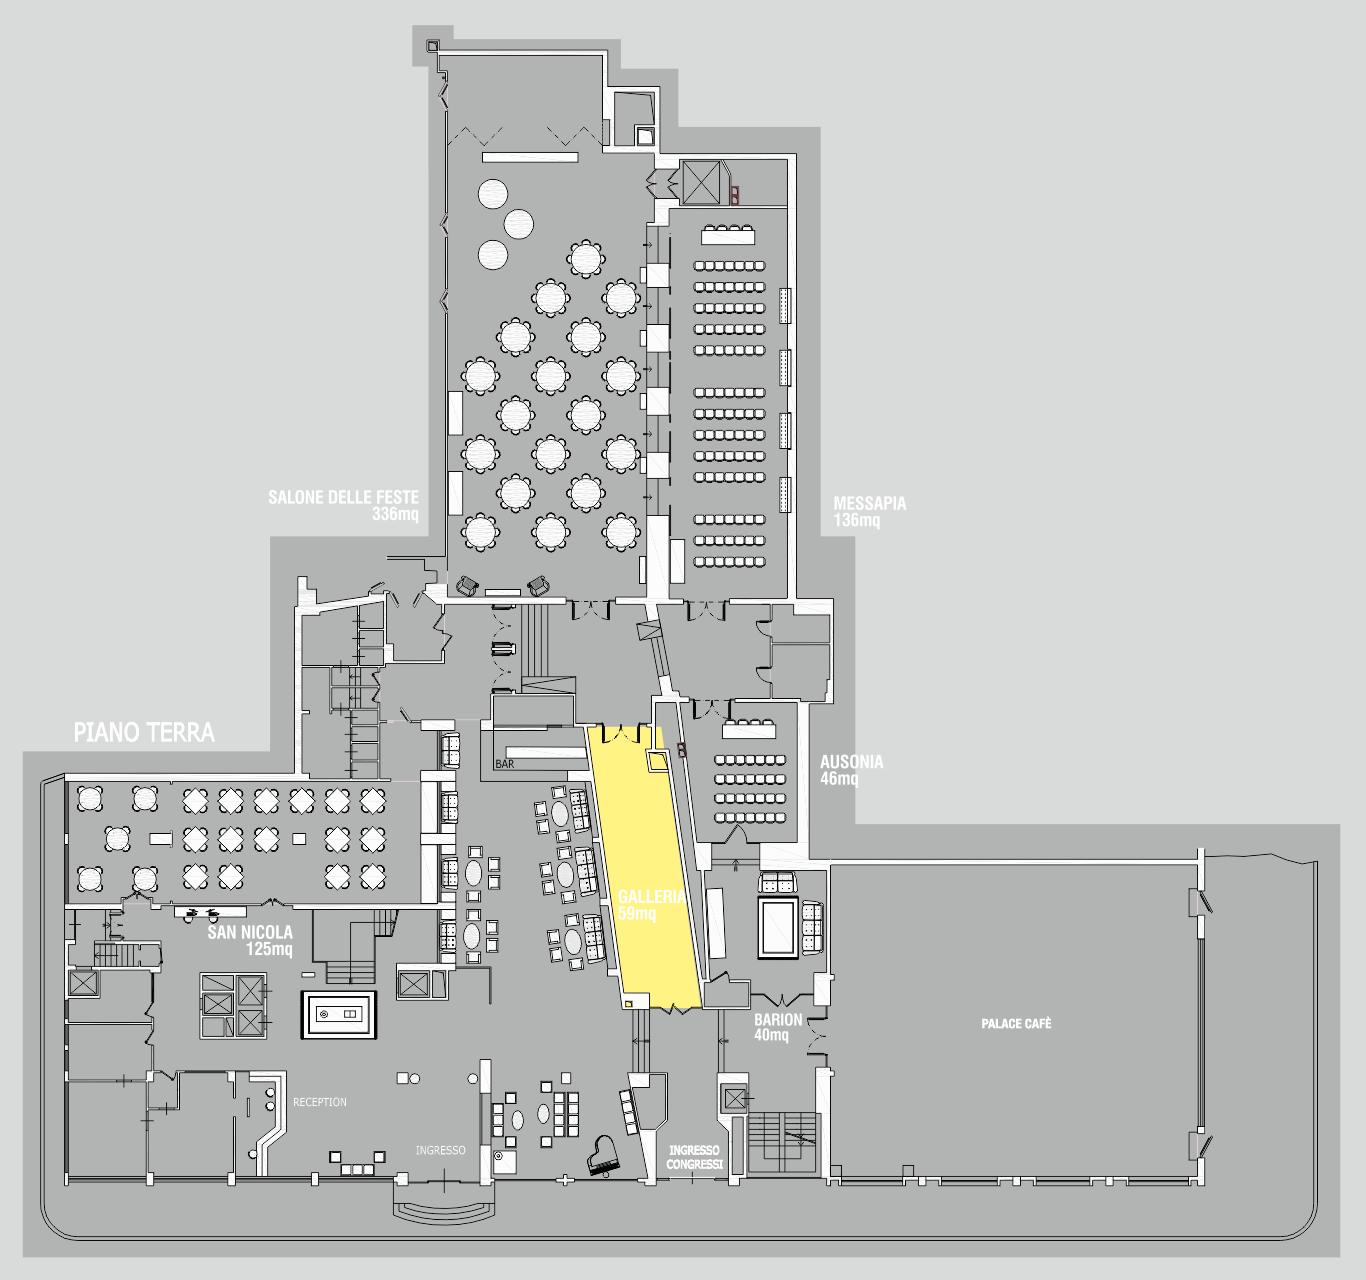 Sala Galleria